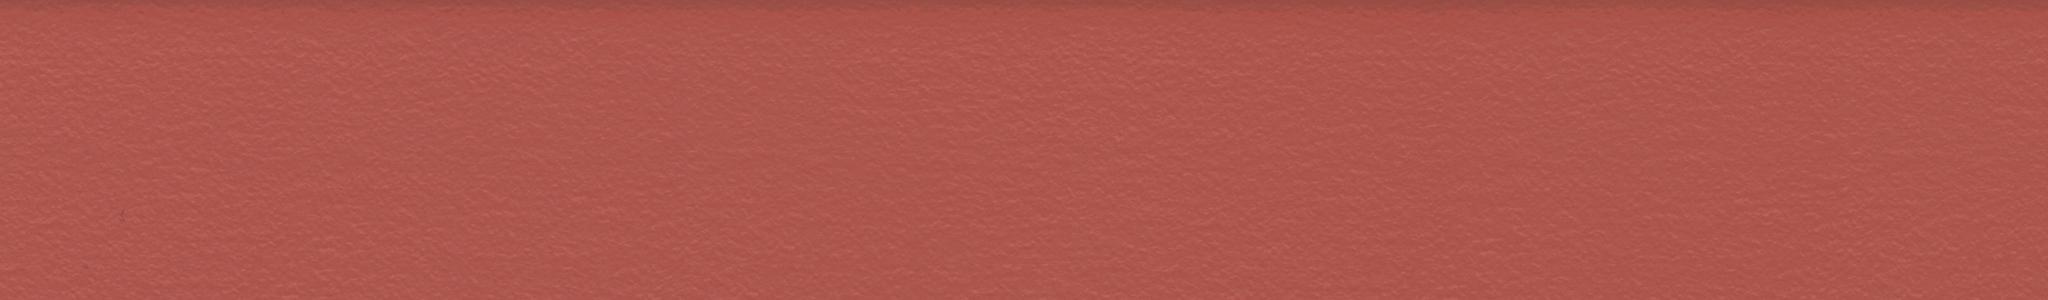 HU 130216 ABS Kante UNI Rot feinperl 107